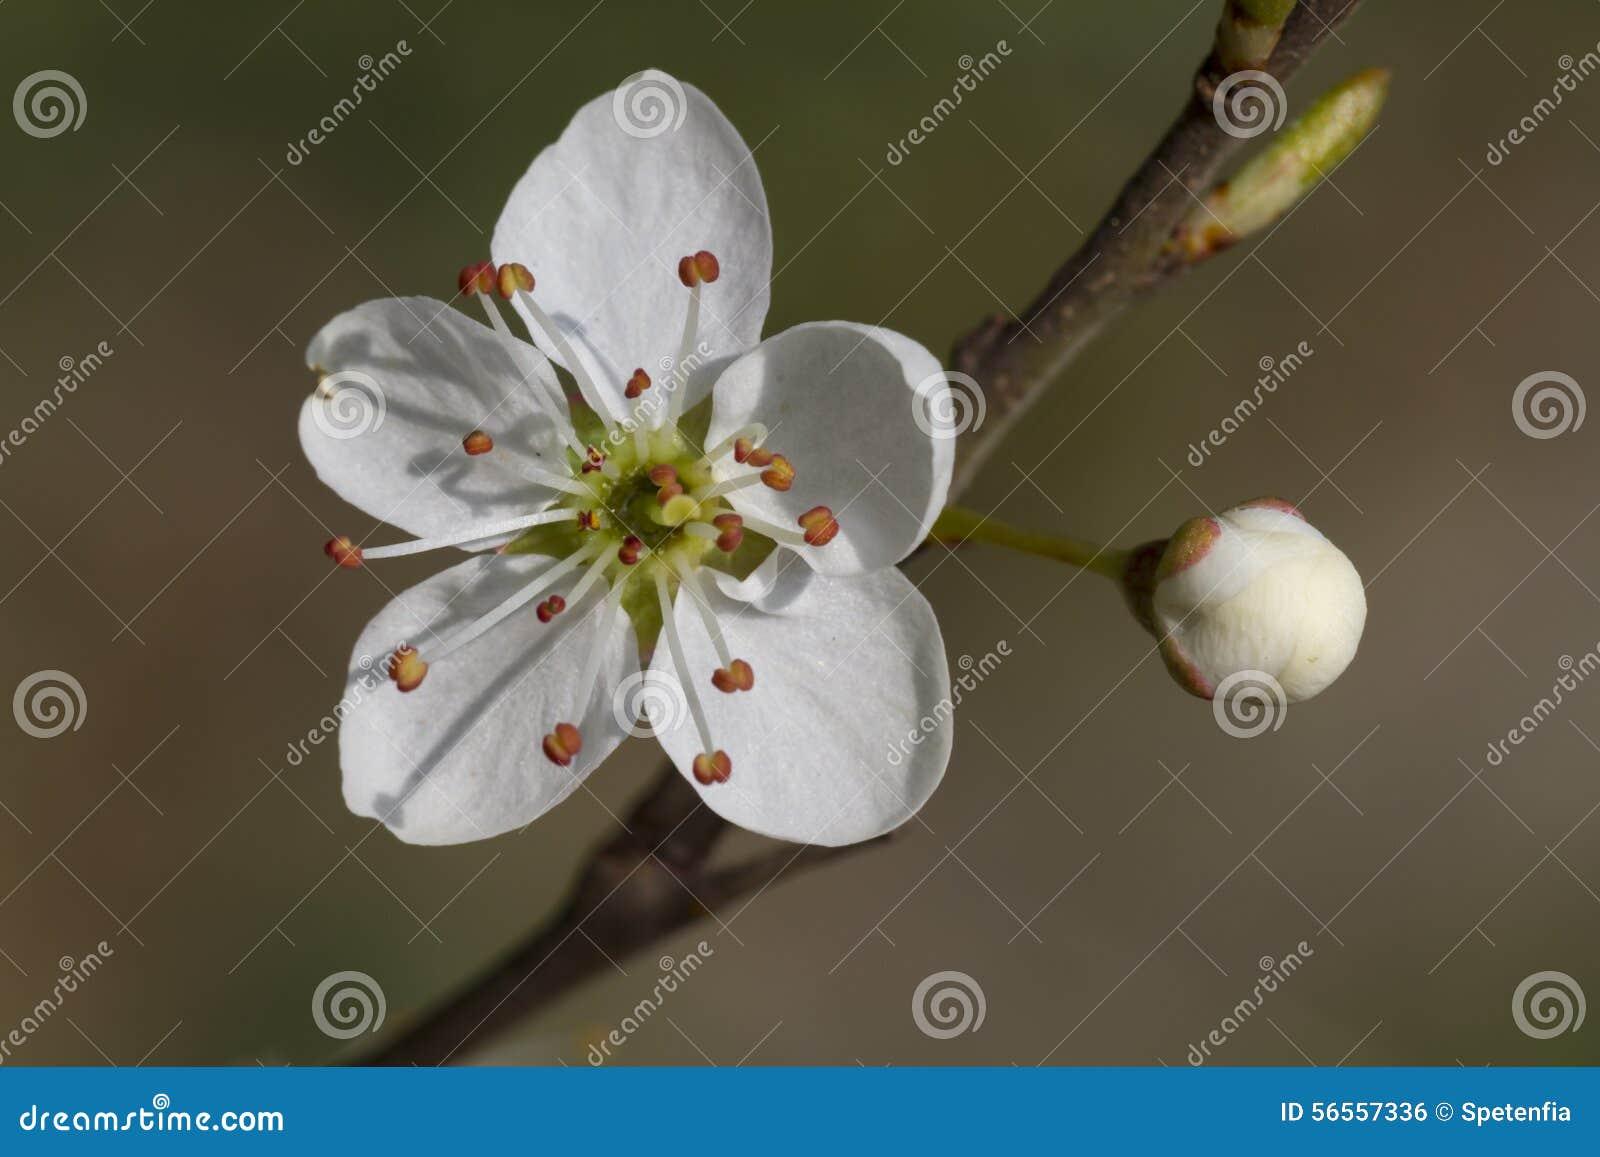 Download Λουλούδι στο δέντρο την άνοιξη Στοκ Εικόνες - εικόνα από άνοιξη, φυτό: 56557336